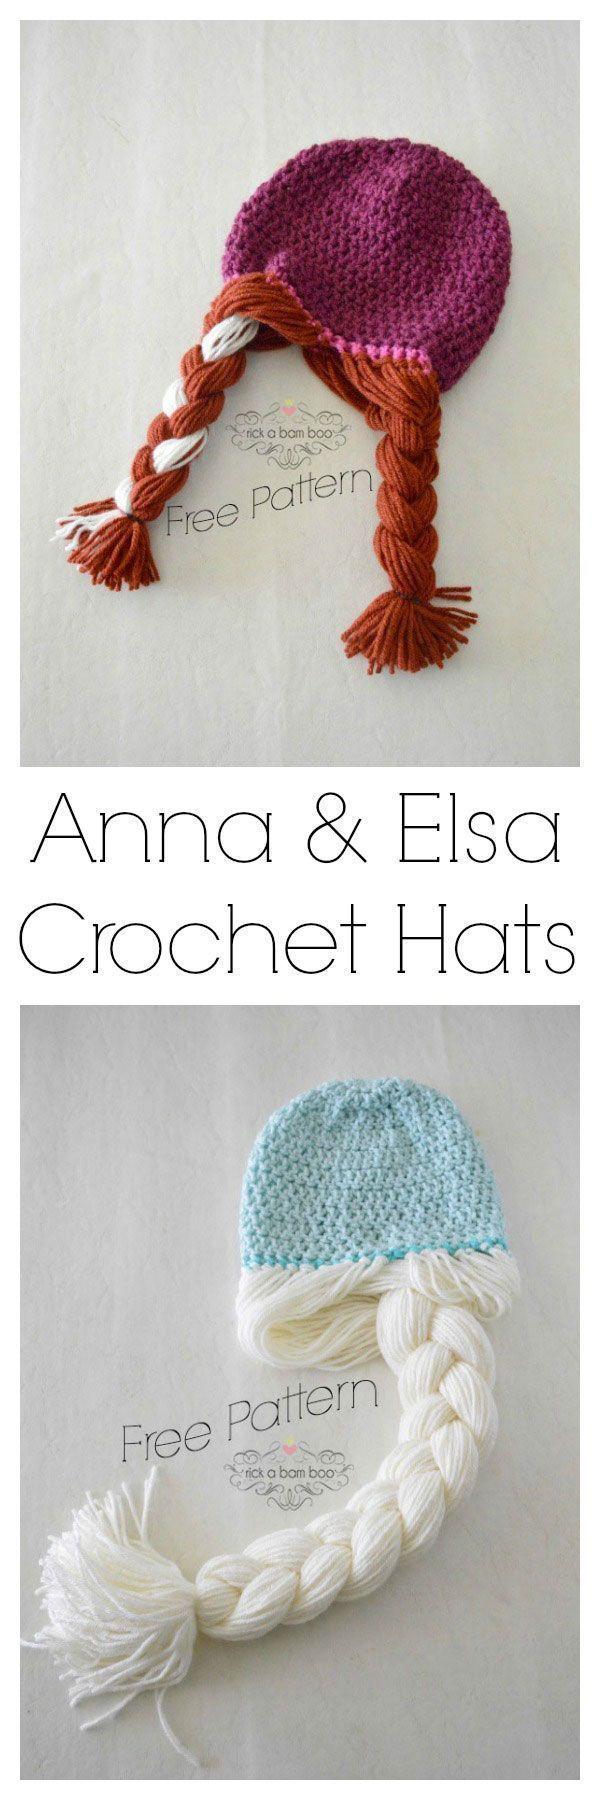 Anna & Elsa Crochet Hats | Crochet | Pinterest